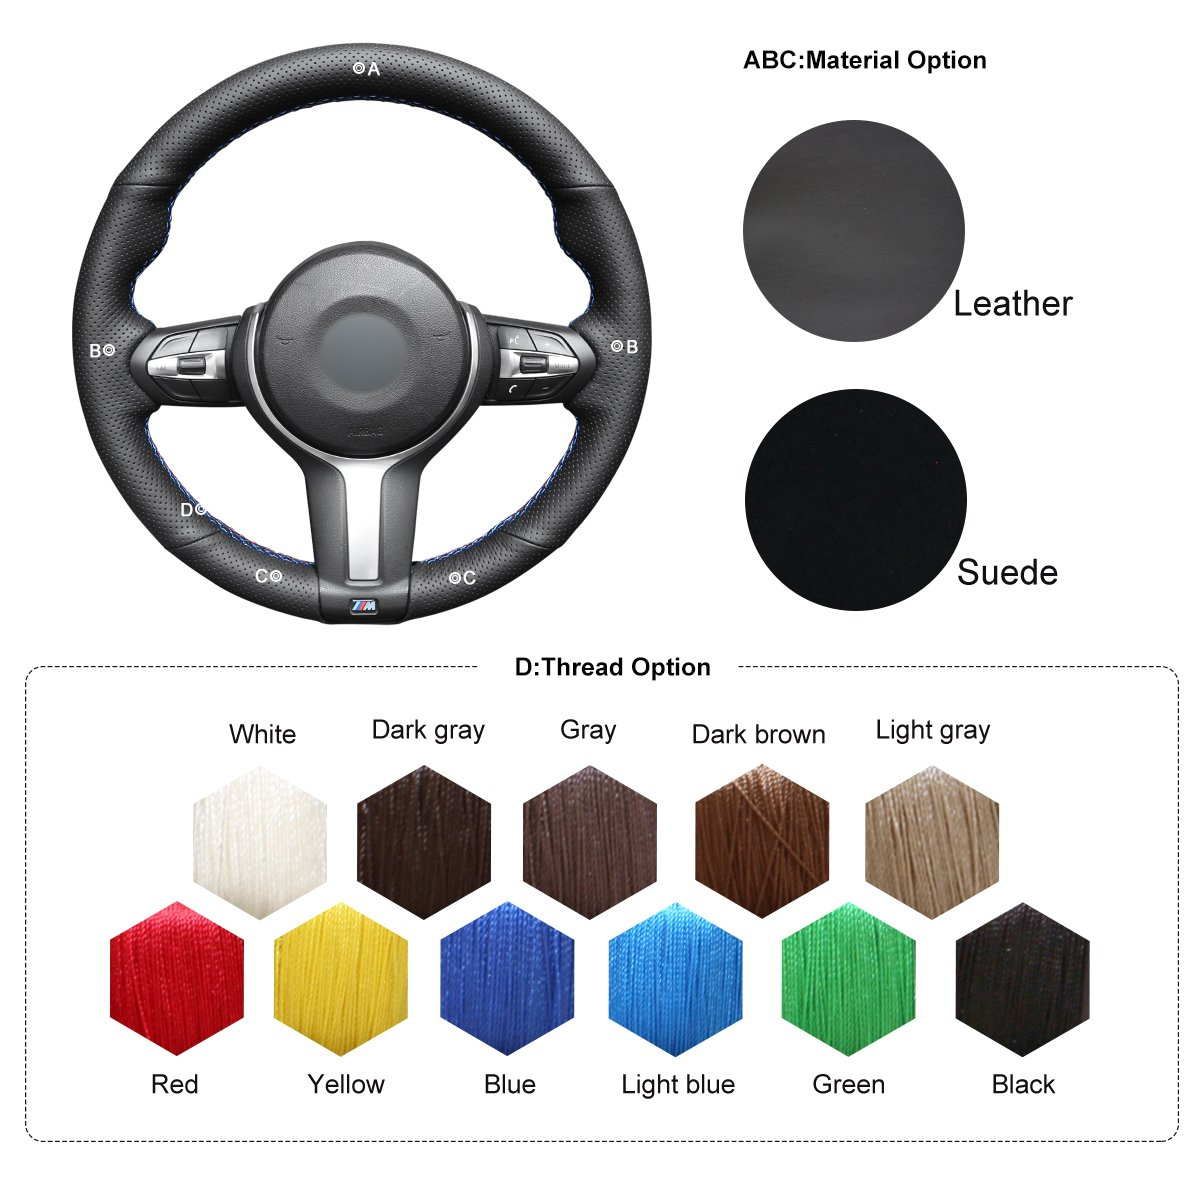 MEWANT Handmade DIY Black Artificial Leather Car Steering Wheel Covers Wrap for F87 M2 2015-2017 F80 M3 2014-2017 F82 M4 M5 F12 F13 M6 F85 X 5 M F86 X 6 M F33 F30 M Sport